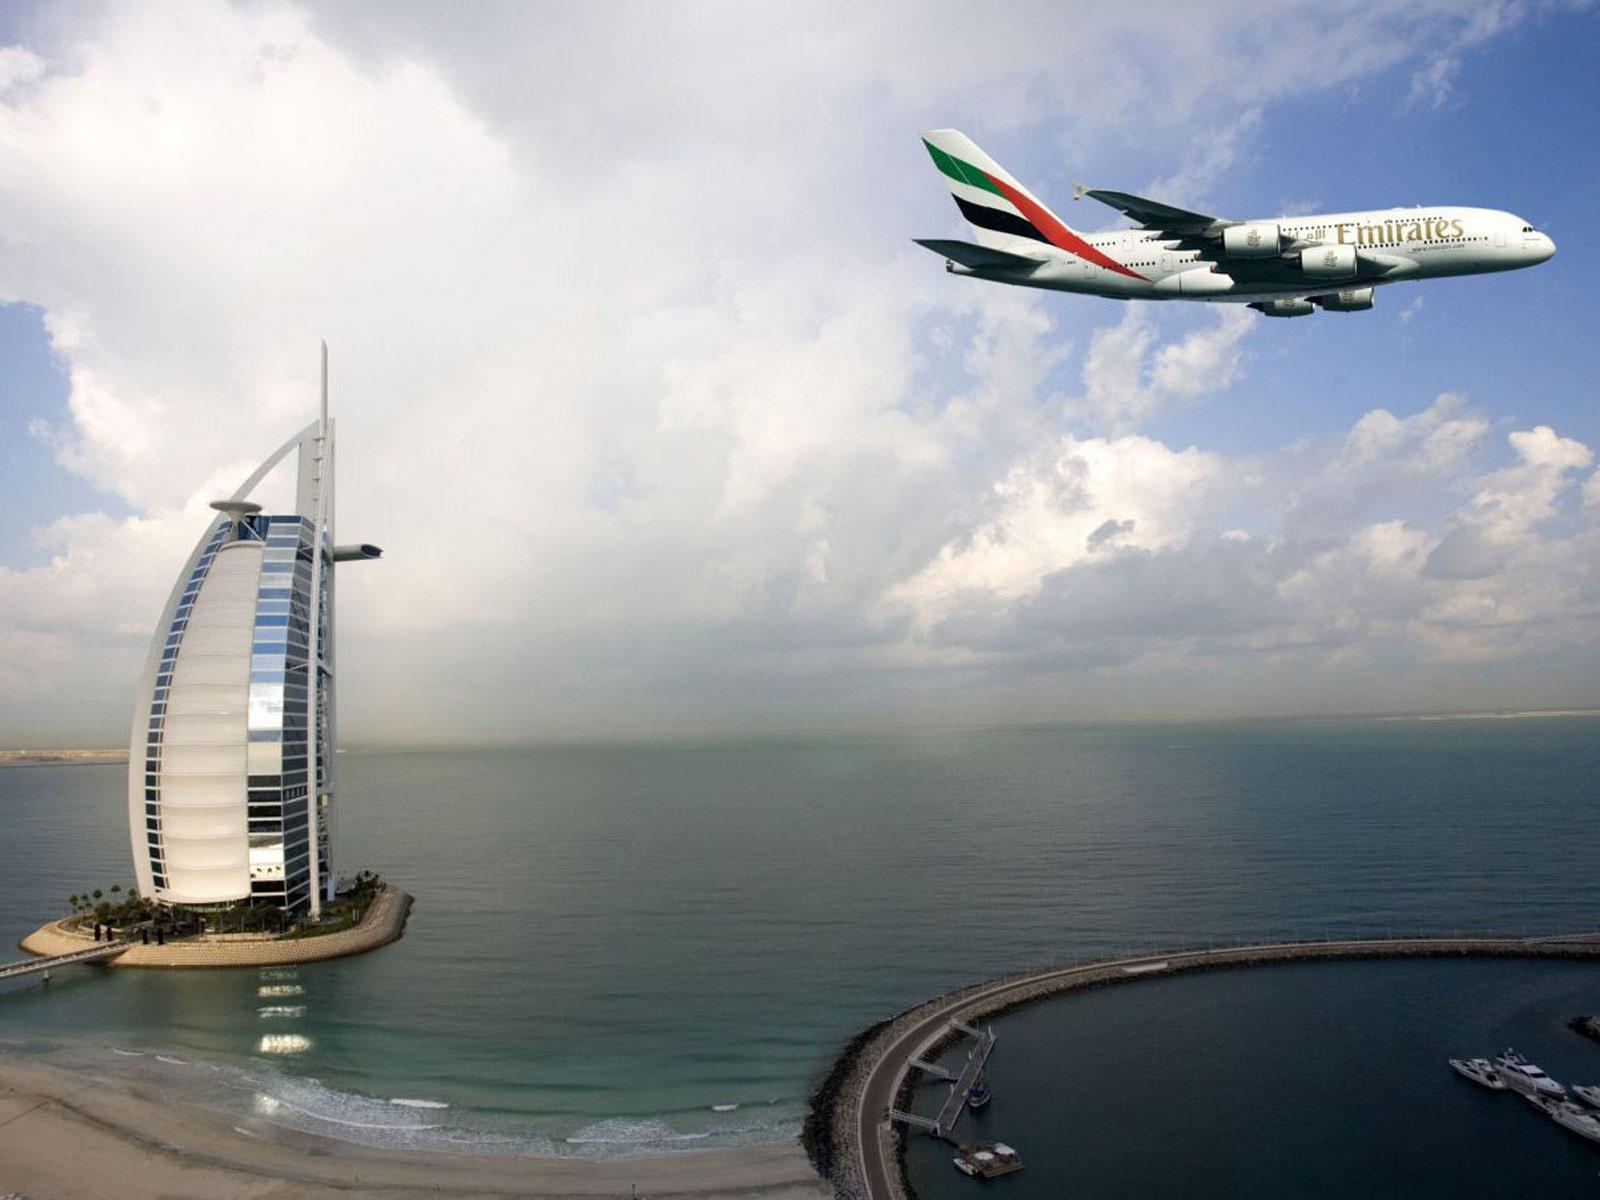 Emirates Dubai Burj Al Arab Wallpapers HD Wallpapers Chainimage 1600x1200